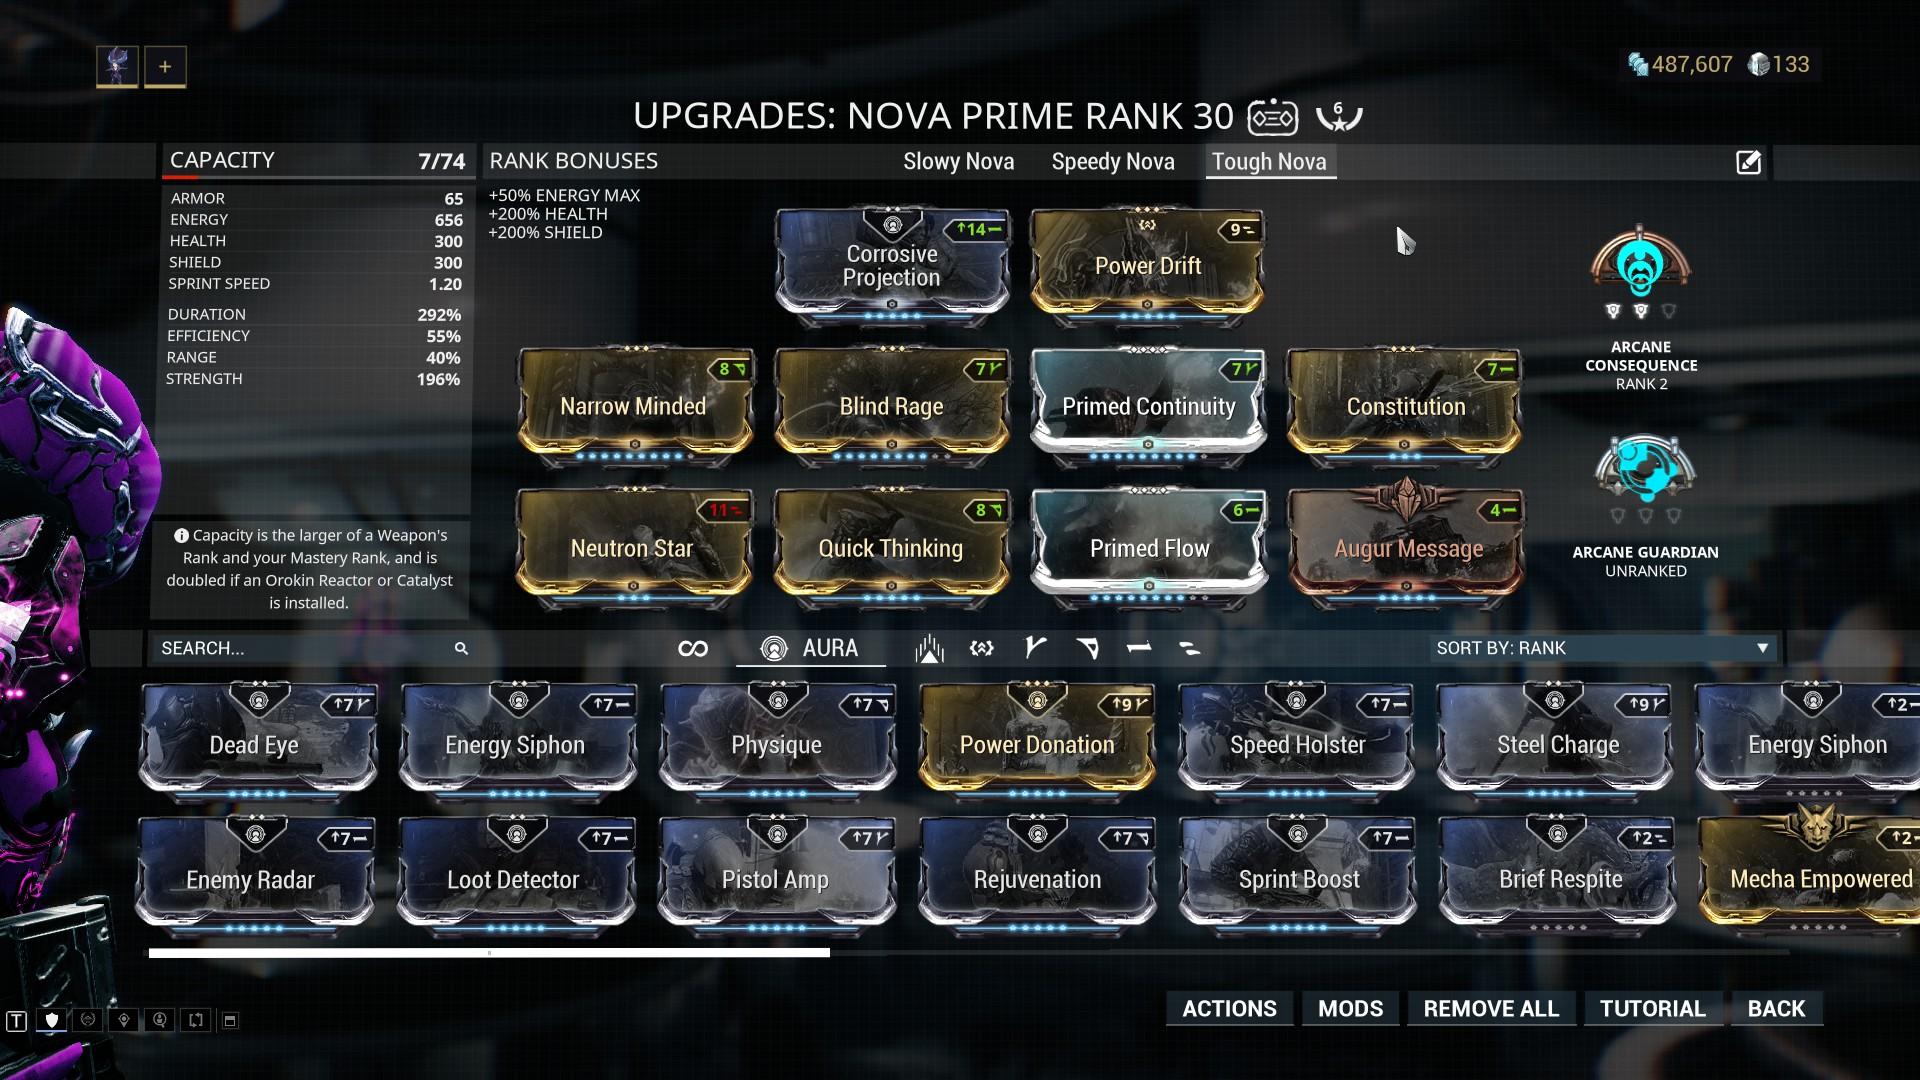 Steam Community Guide Melan S Guide To Everything Nova The most underrated nova build | warframe 2020 keep the channel alive. melan s guide to everything nova